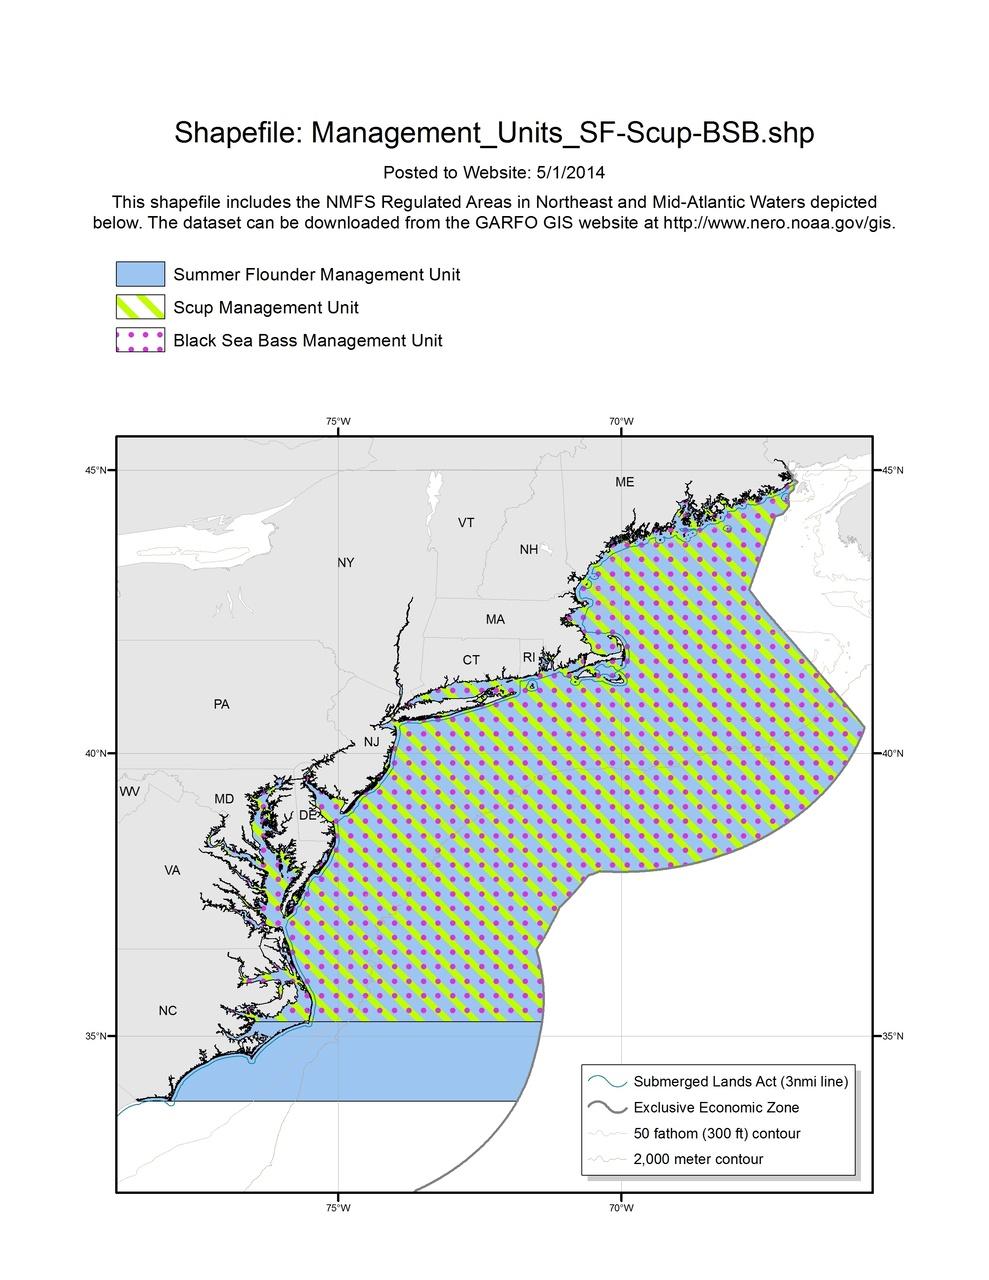 Management-Units-SF-Scup-BSB-MAP-NOAA-GARFO.jpg